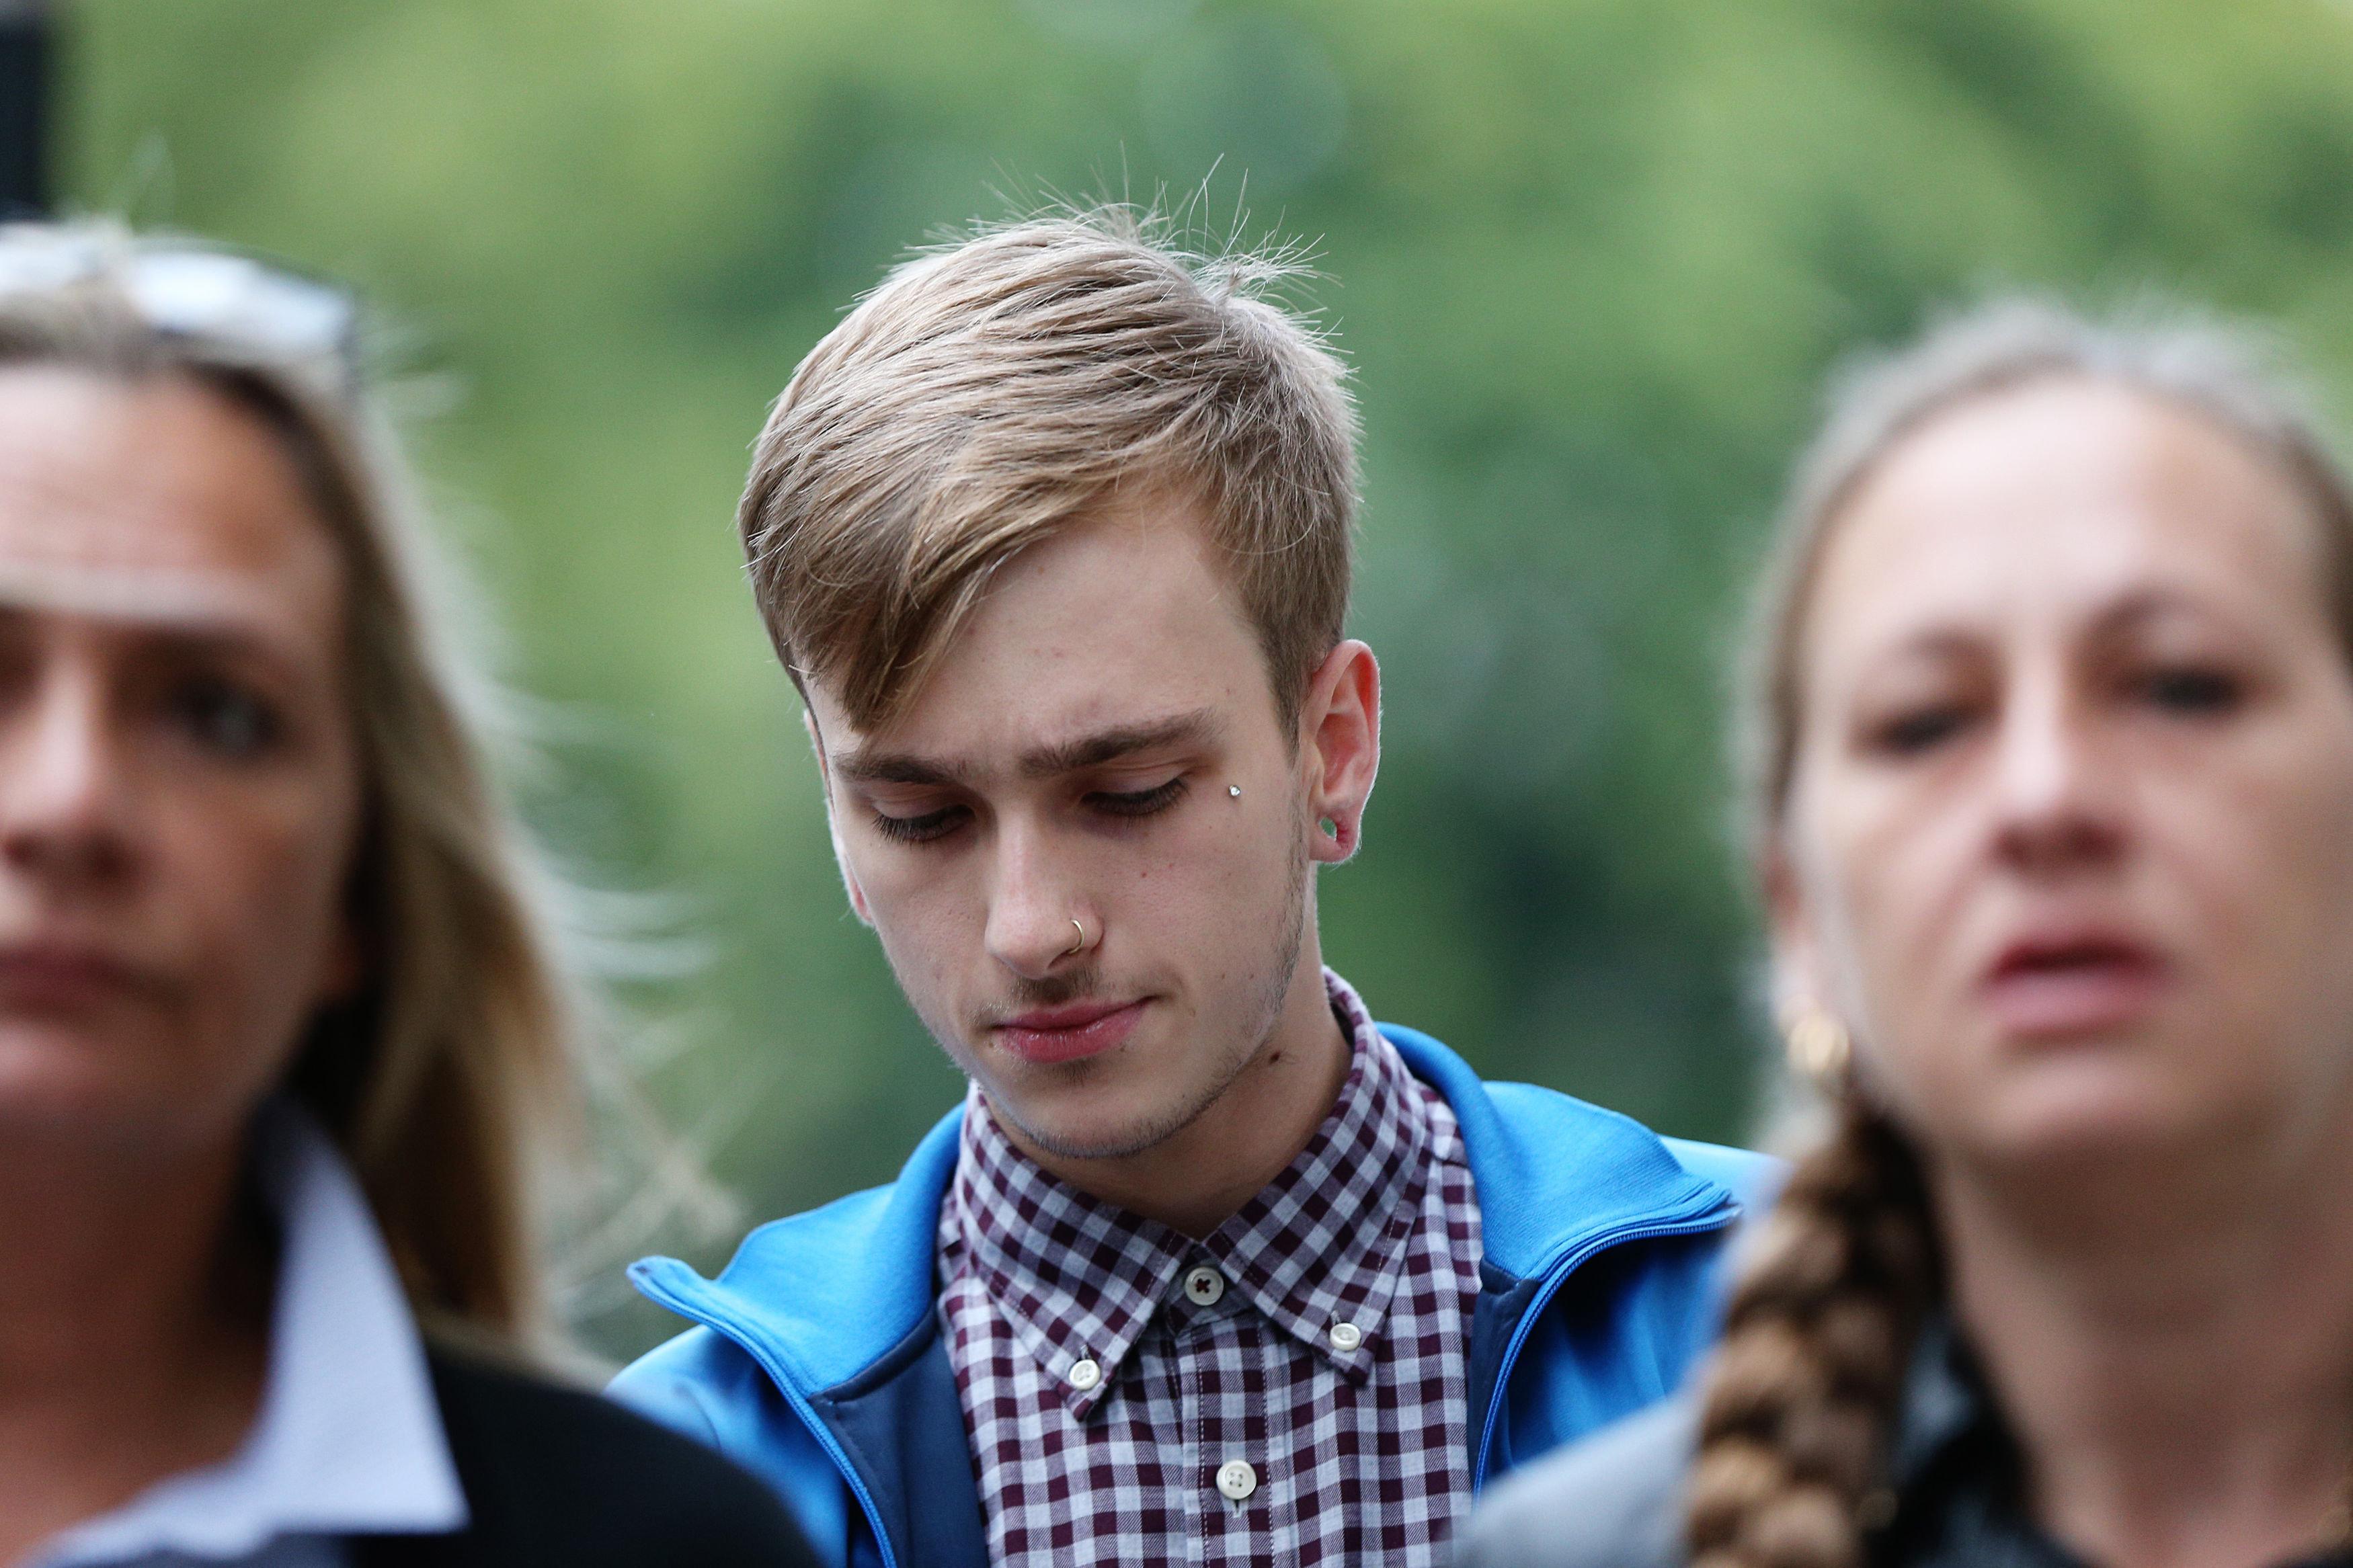 Cyclist Charlie Alliston jailed for 18 months over death of pedestrian